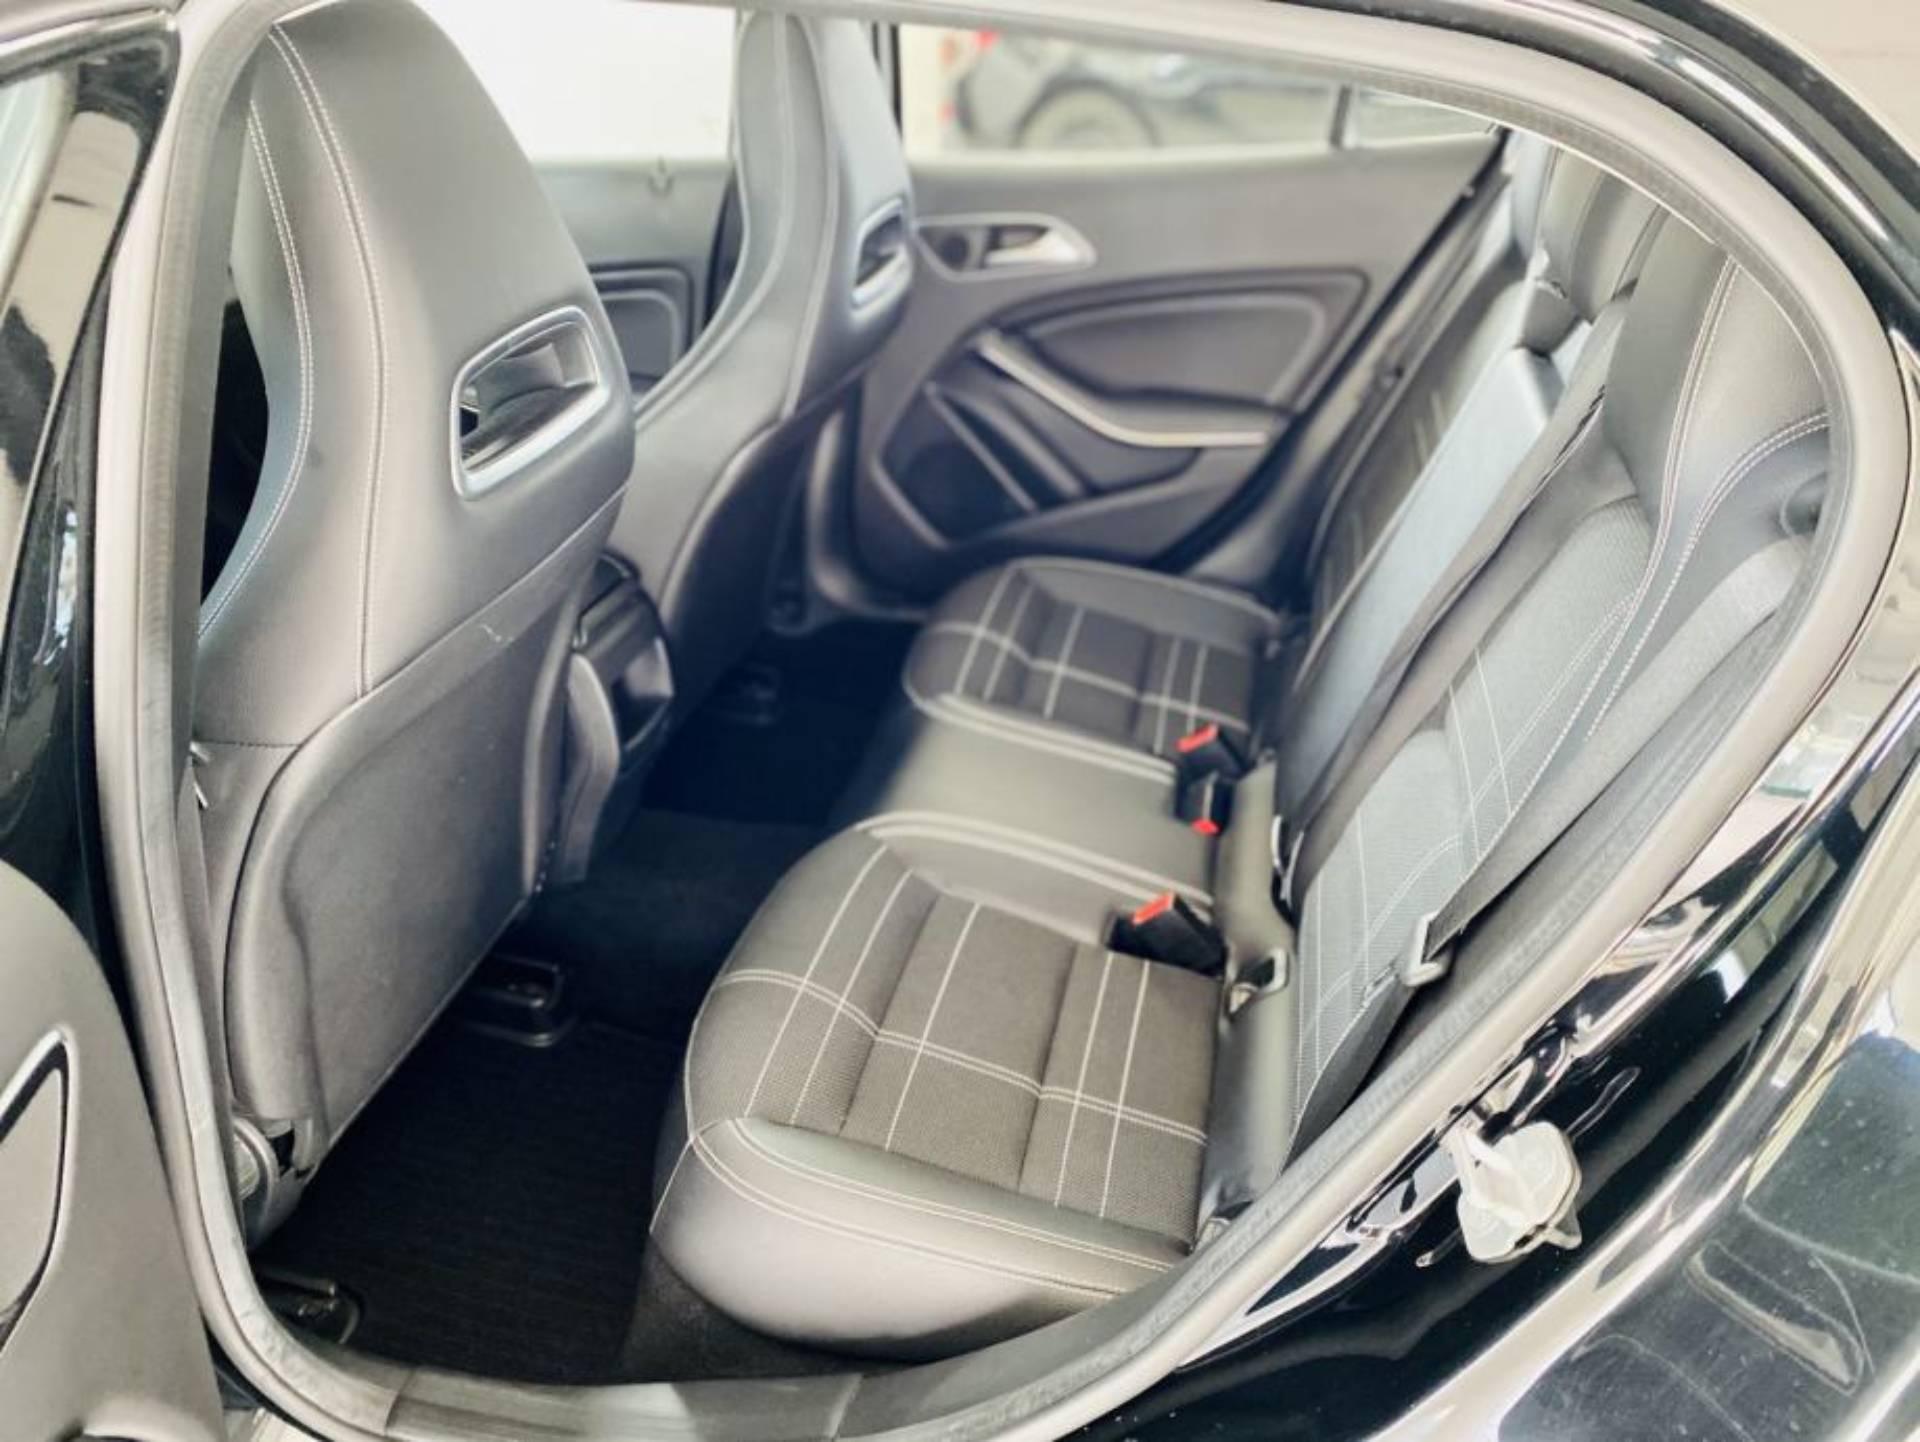 Mercedes-Benz GLA 200 CDI Urban 7G